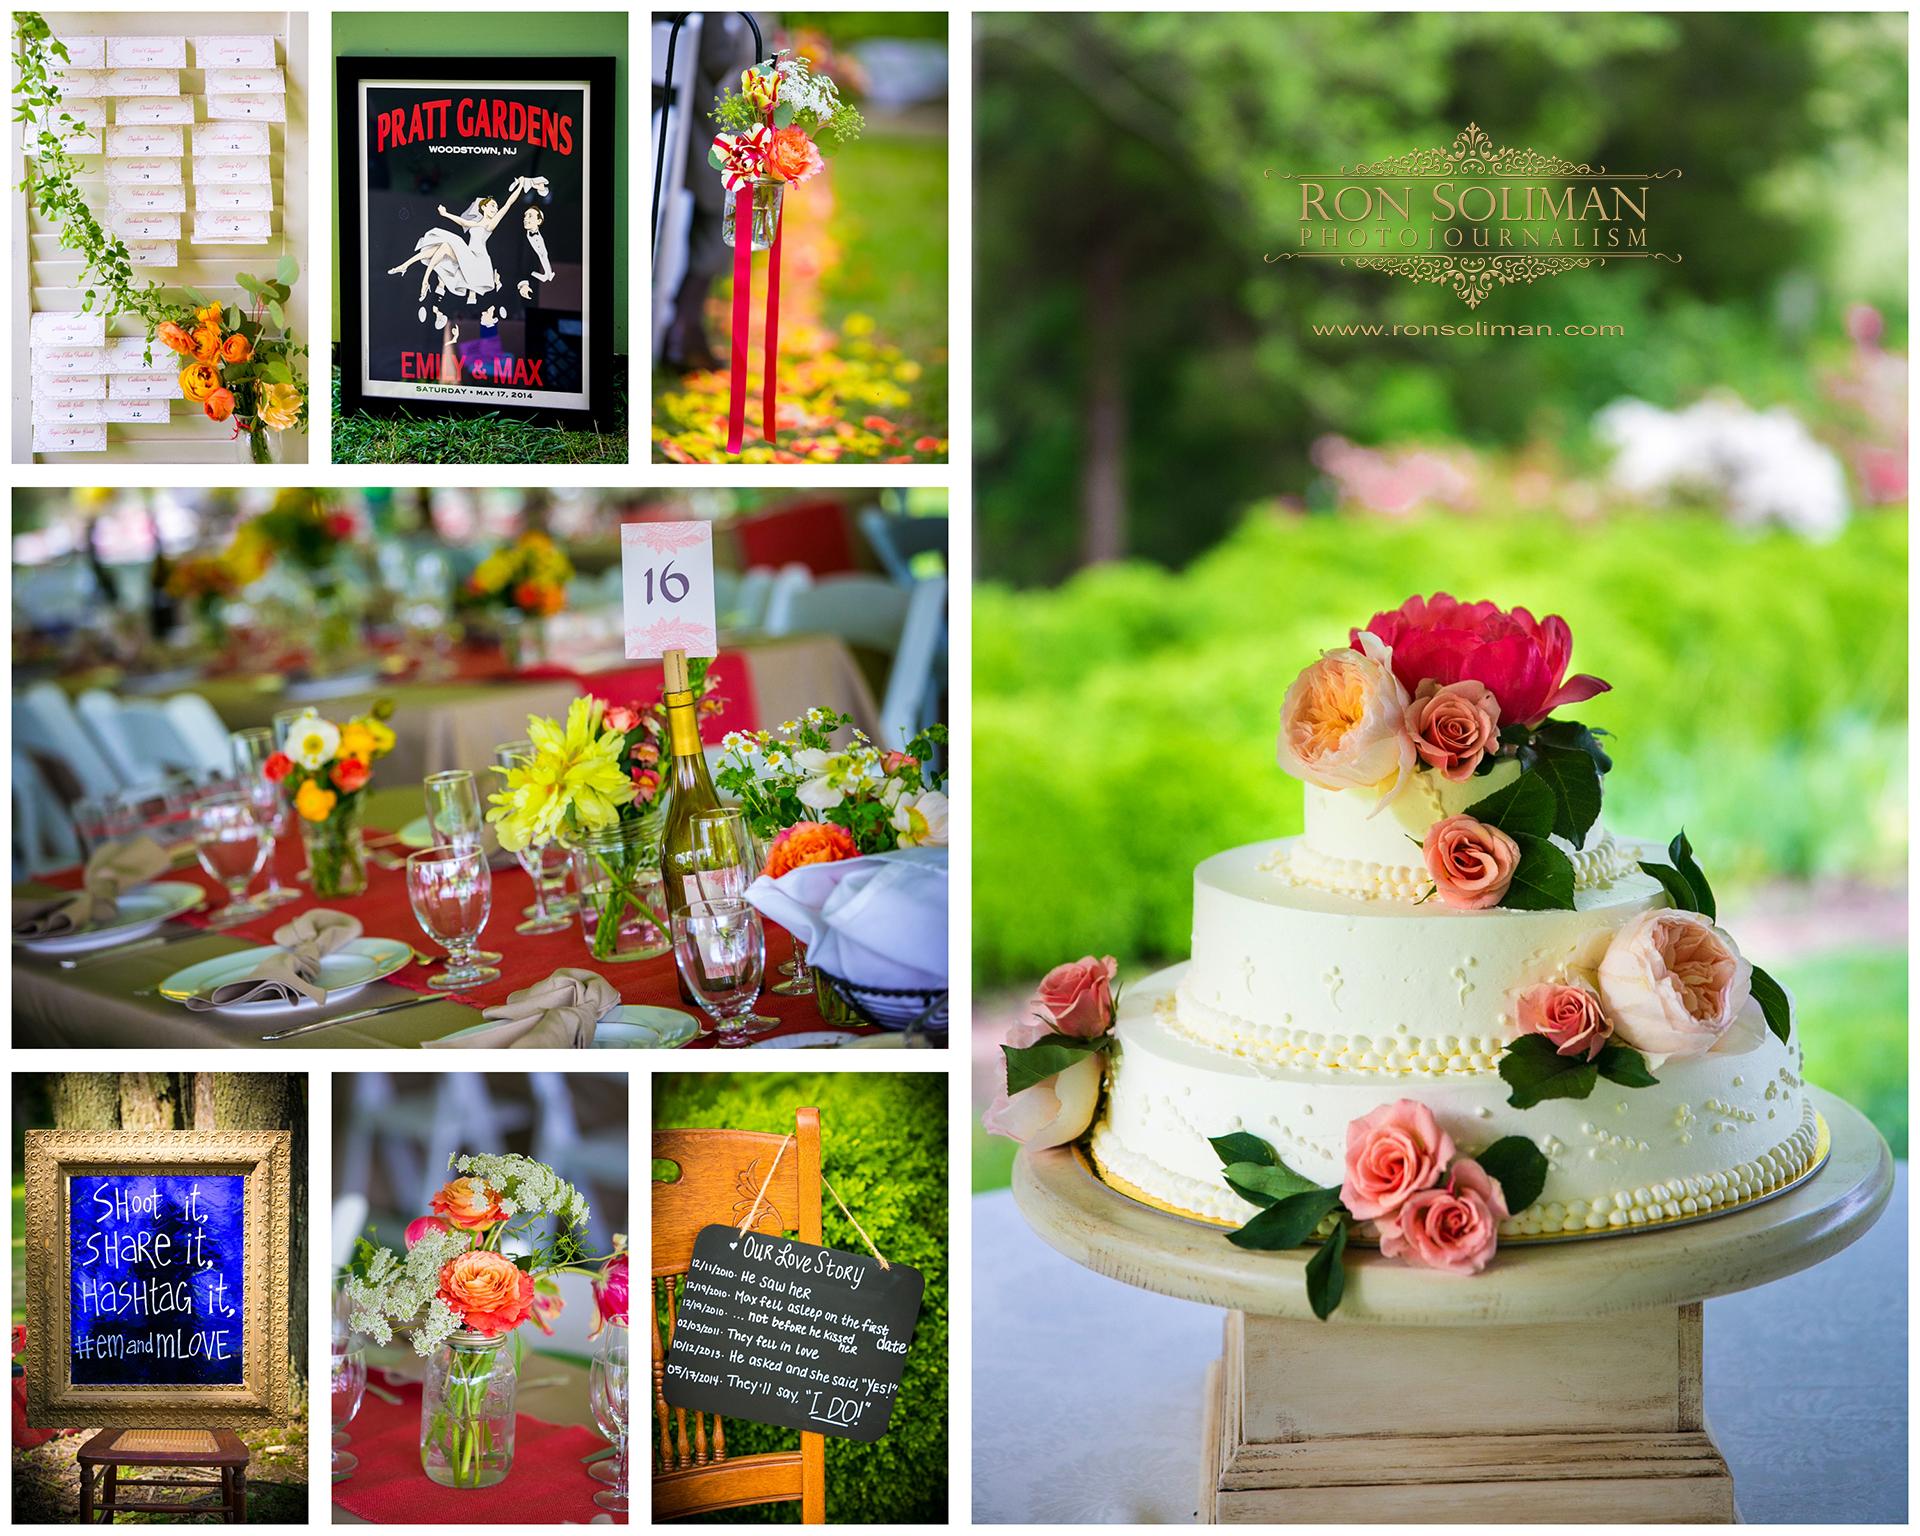 PRATT GARDENS WEDDING